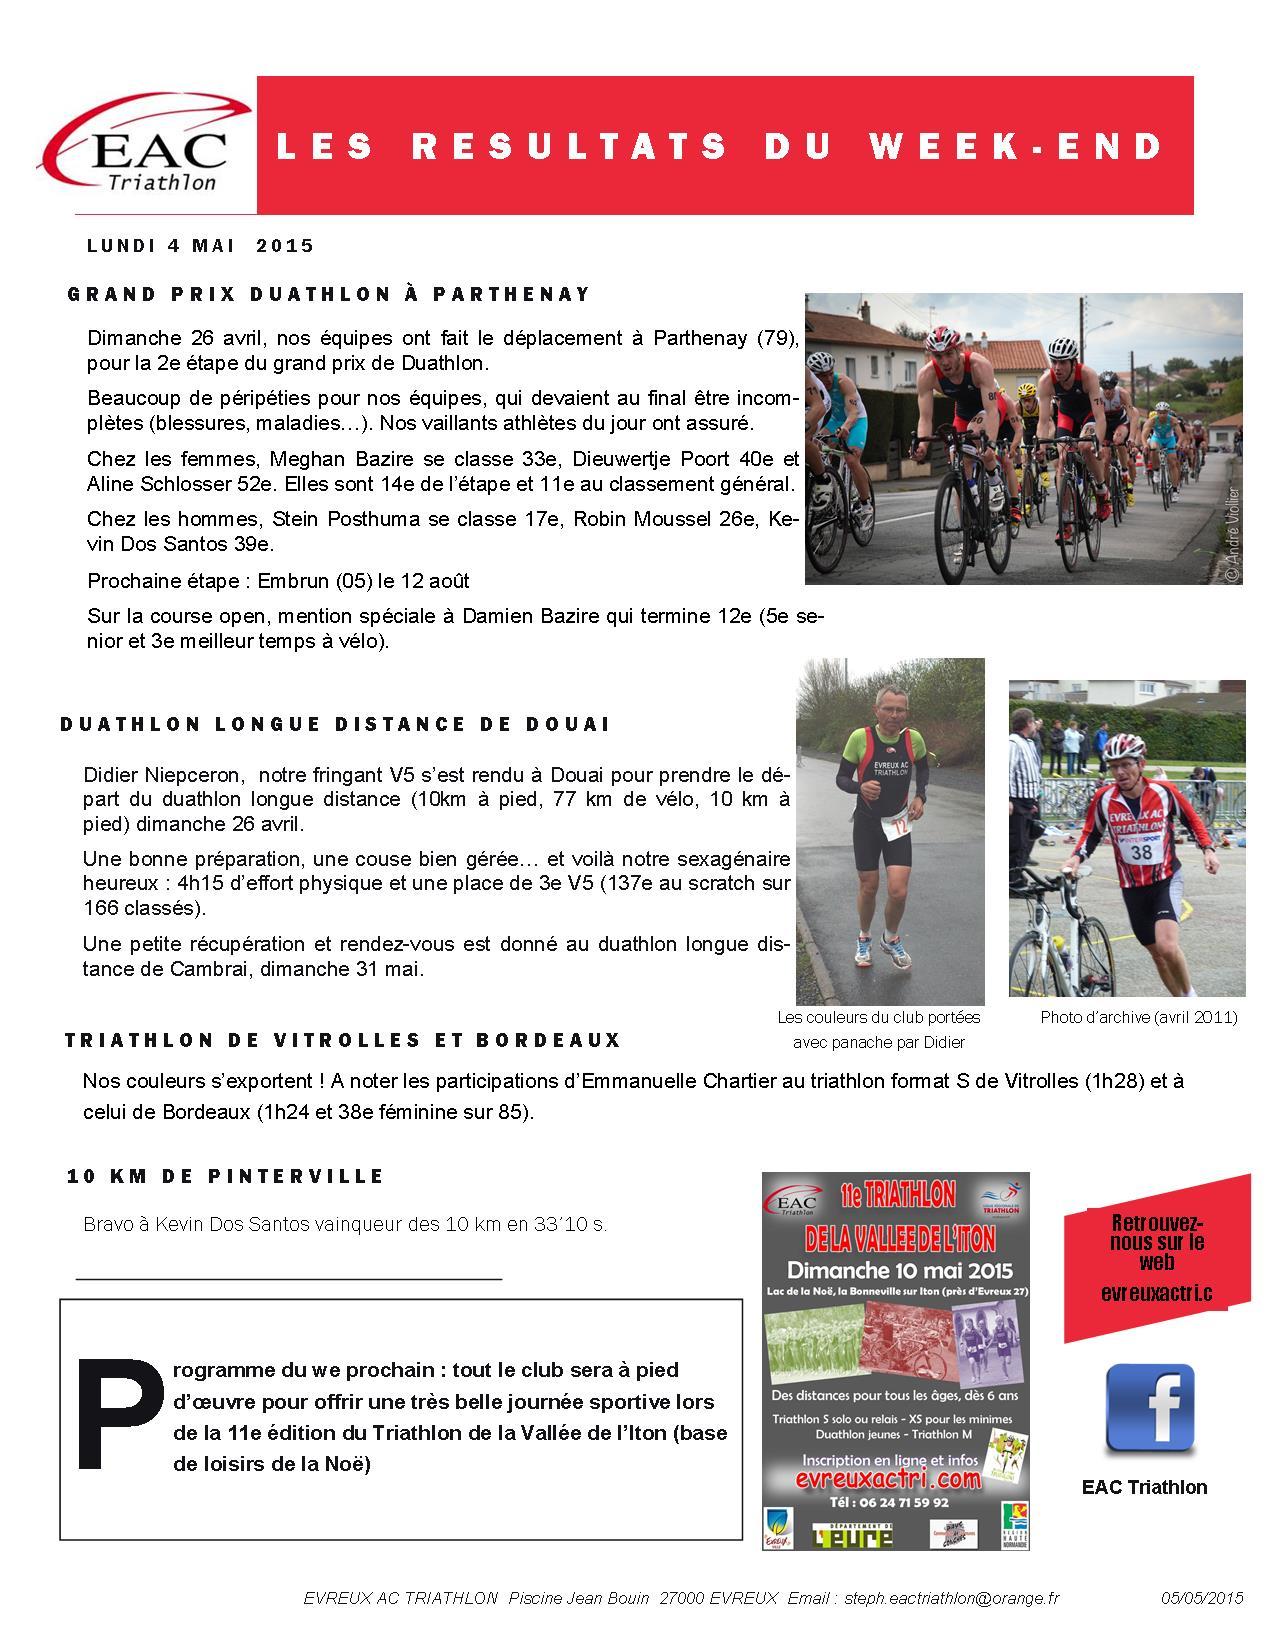 2015 04 27 Grand Prix Parthanay, Duathlon Douai